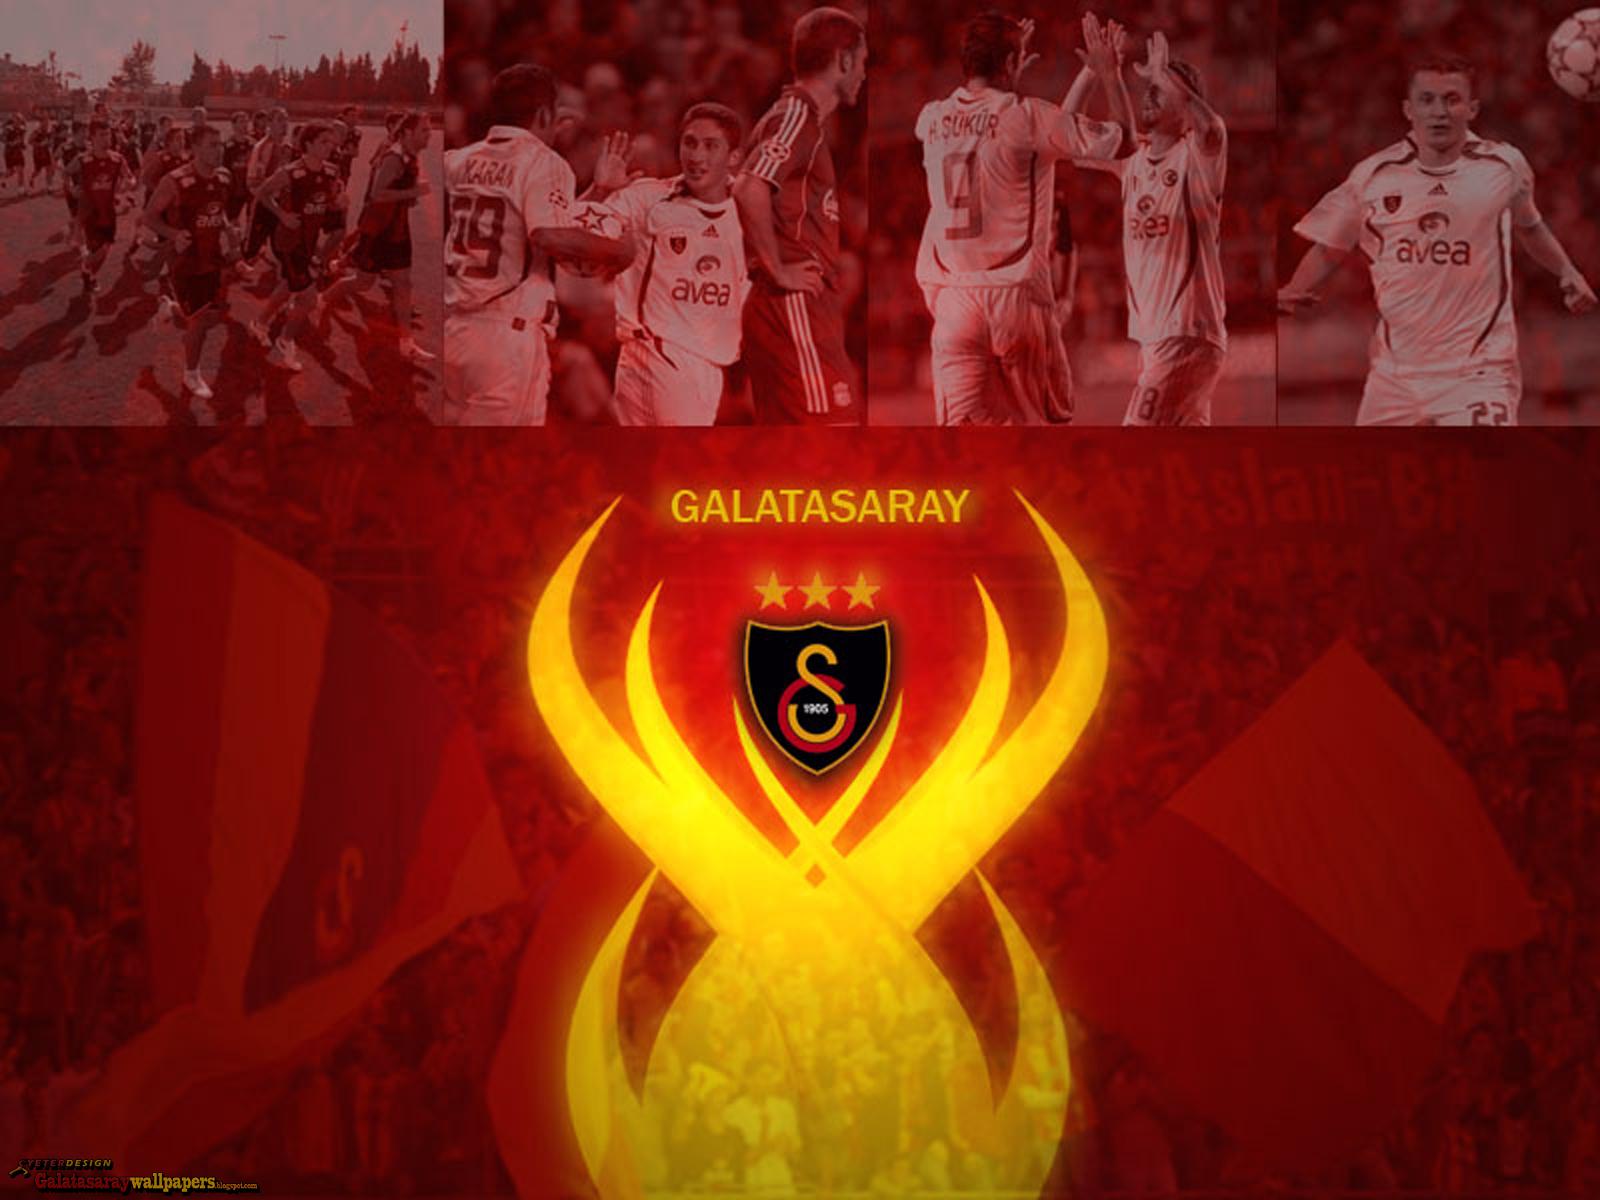 https://1.bp.blogspot.com/_1_qHrQBPgHE/TMTvyUQ40bI/AAAAAAAABIM/ftWjTxfFloo/s1600/Galatasaray+2006-2007+1.jpg